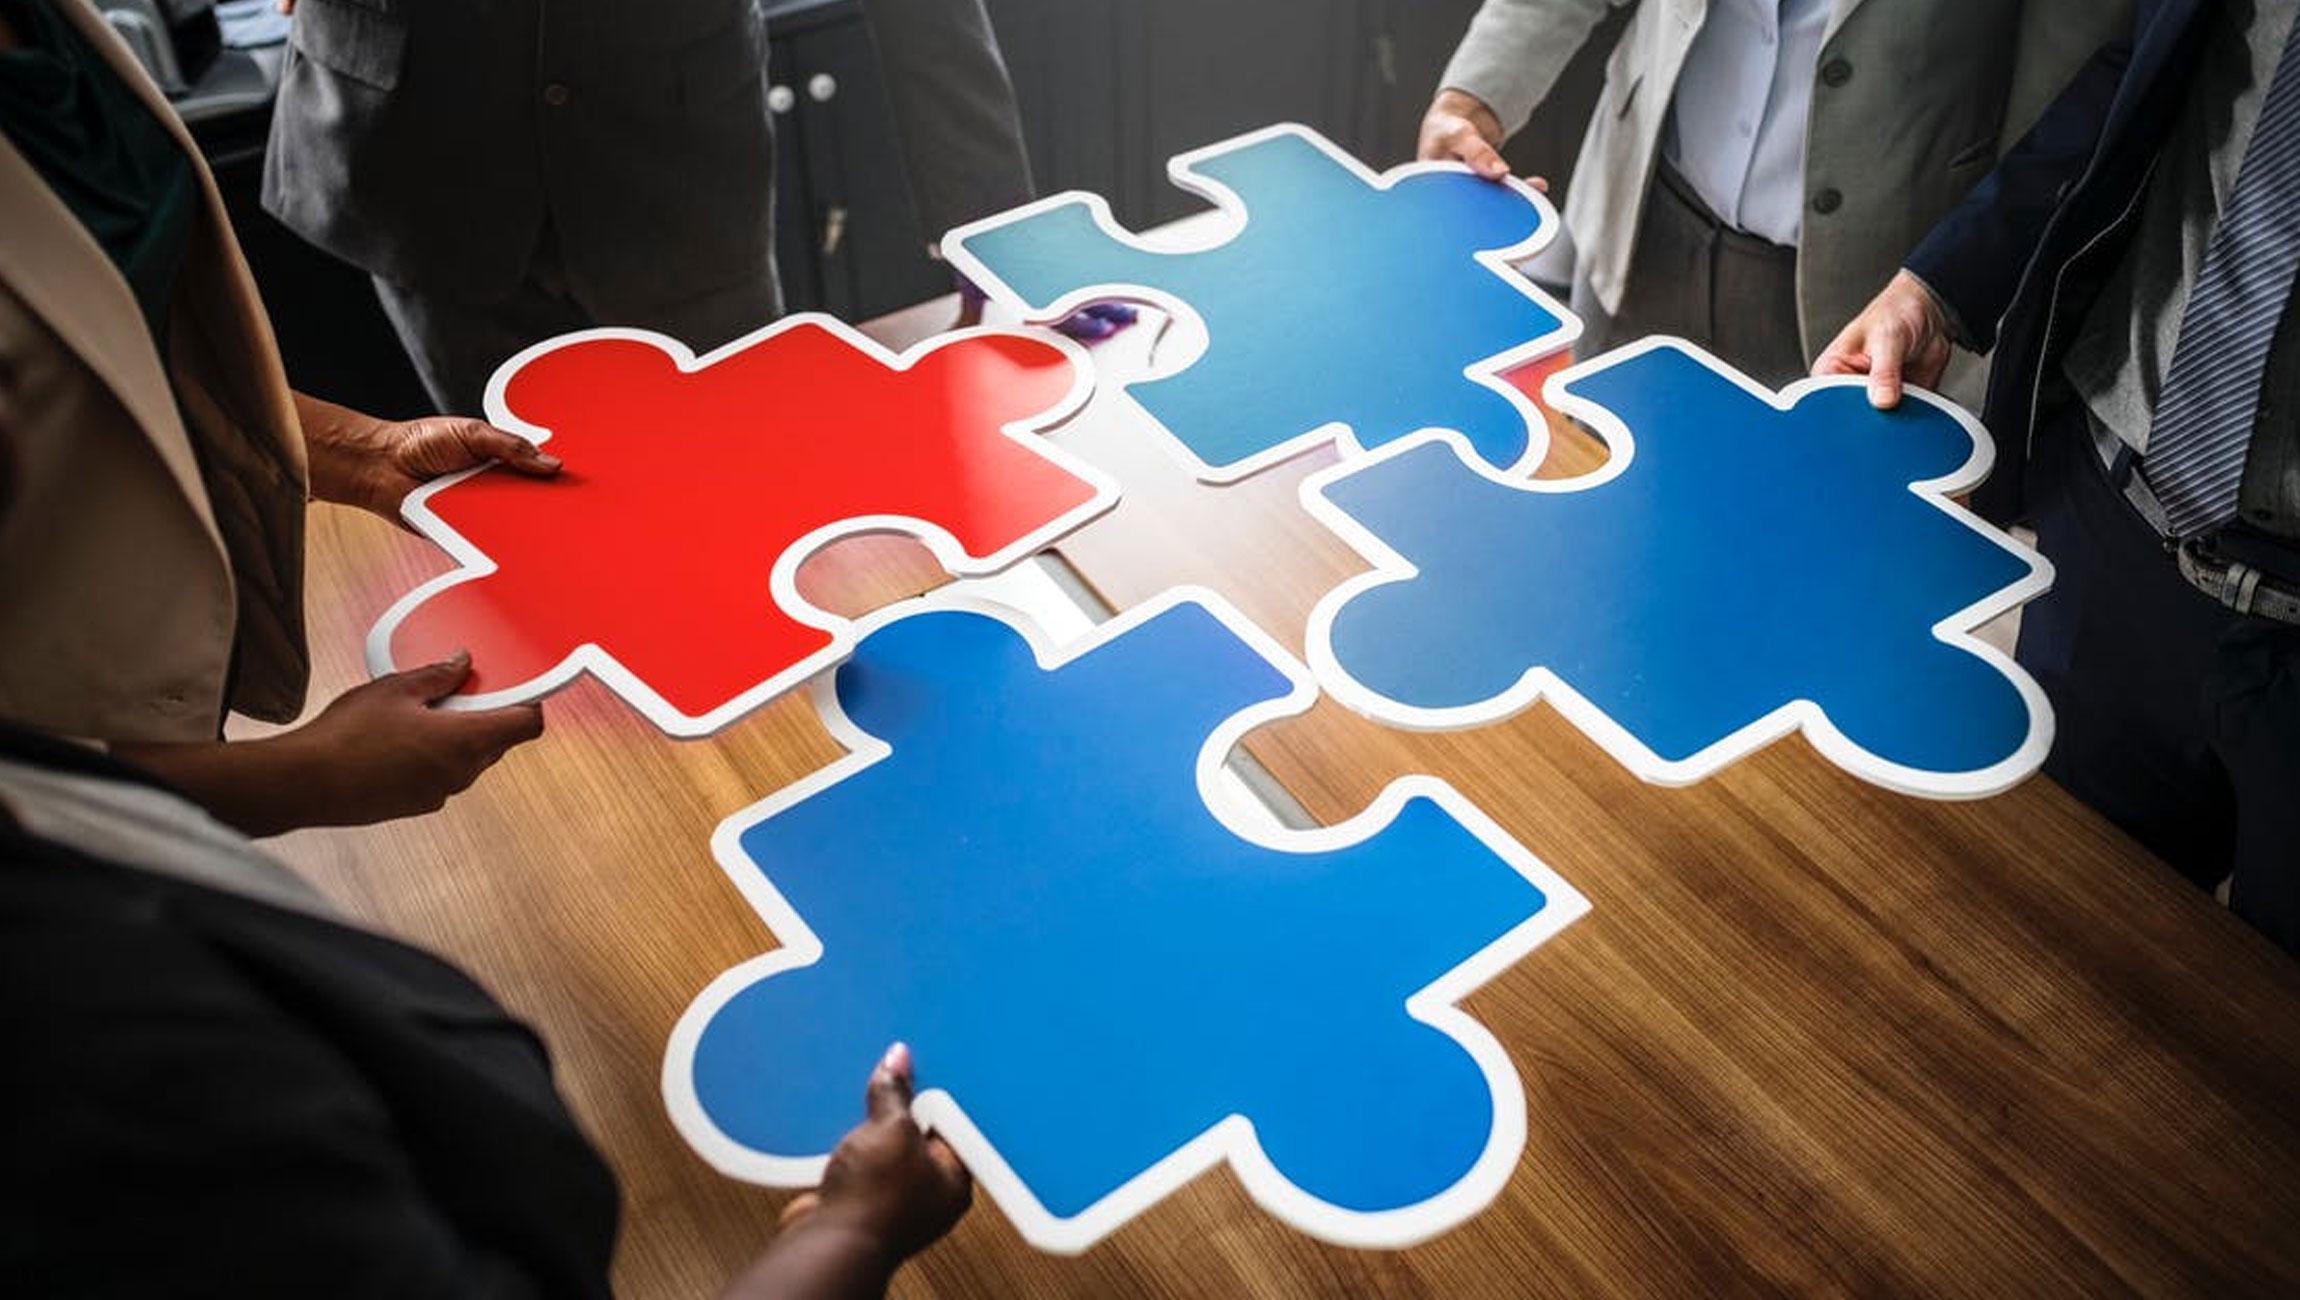 [Guest Post] 5 Ways Partnership Development Will Change in 2019